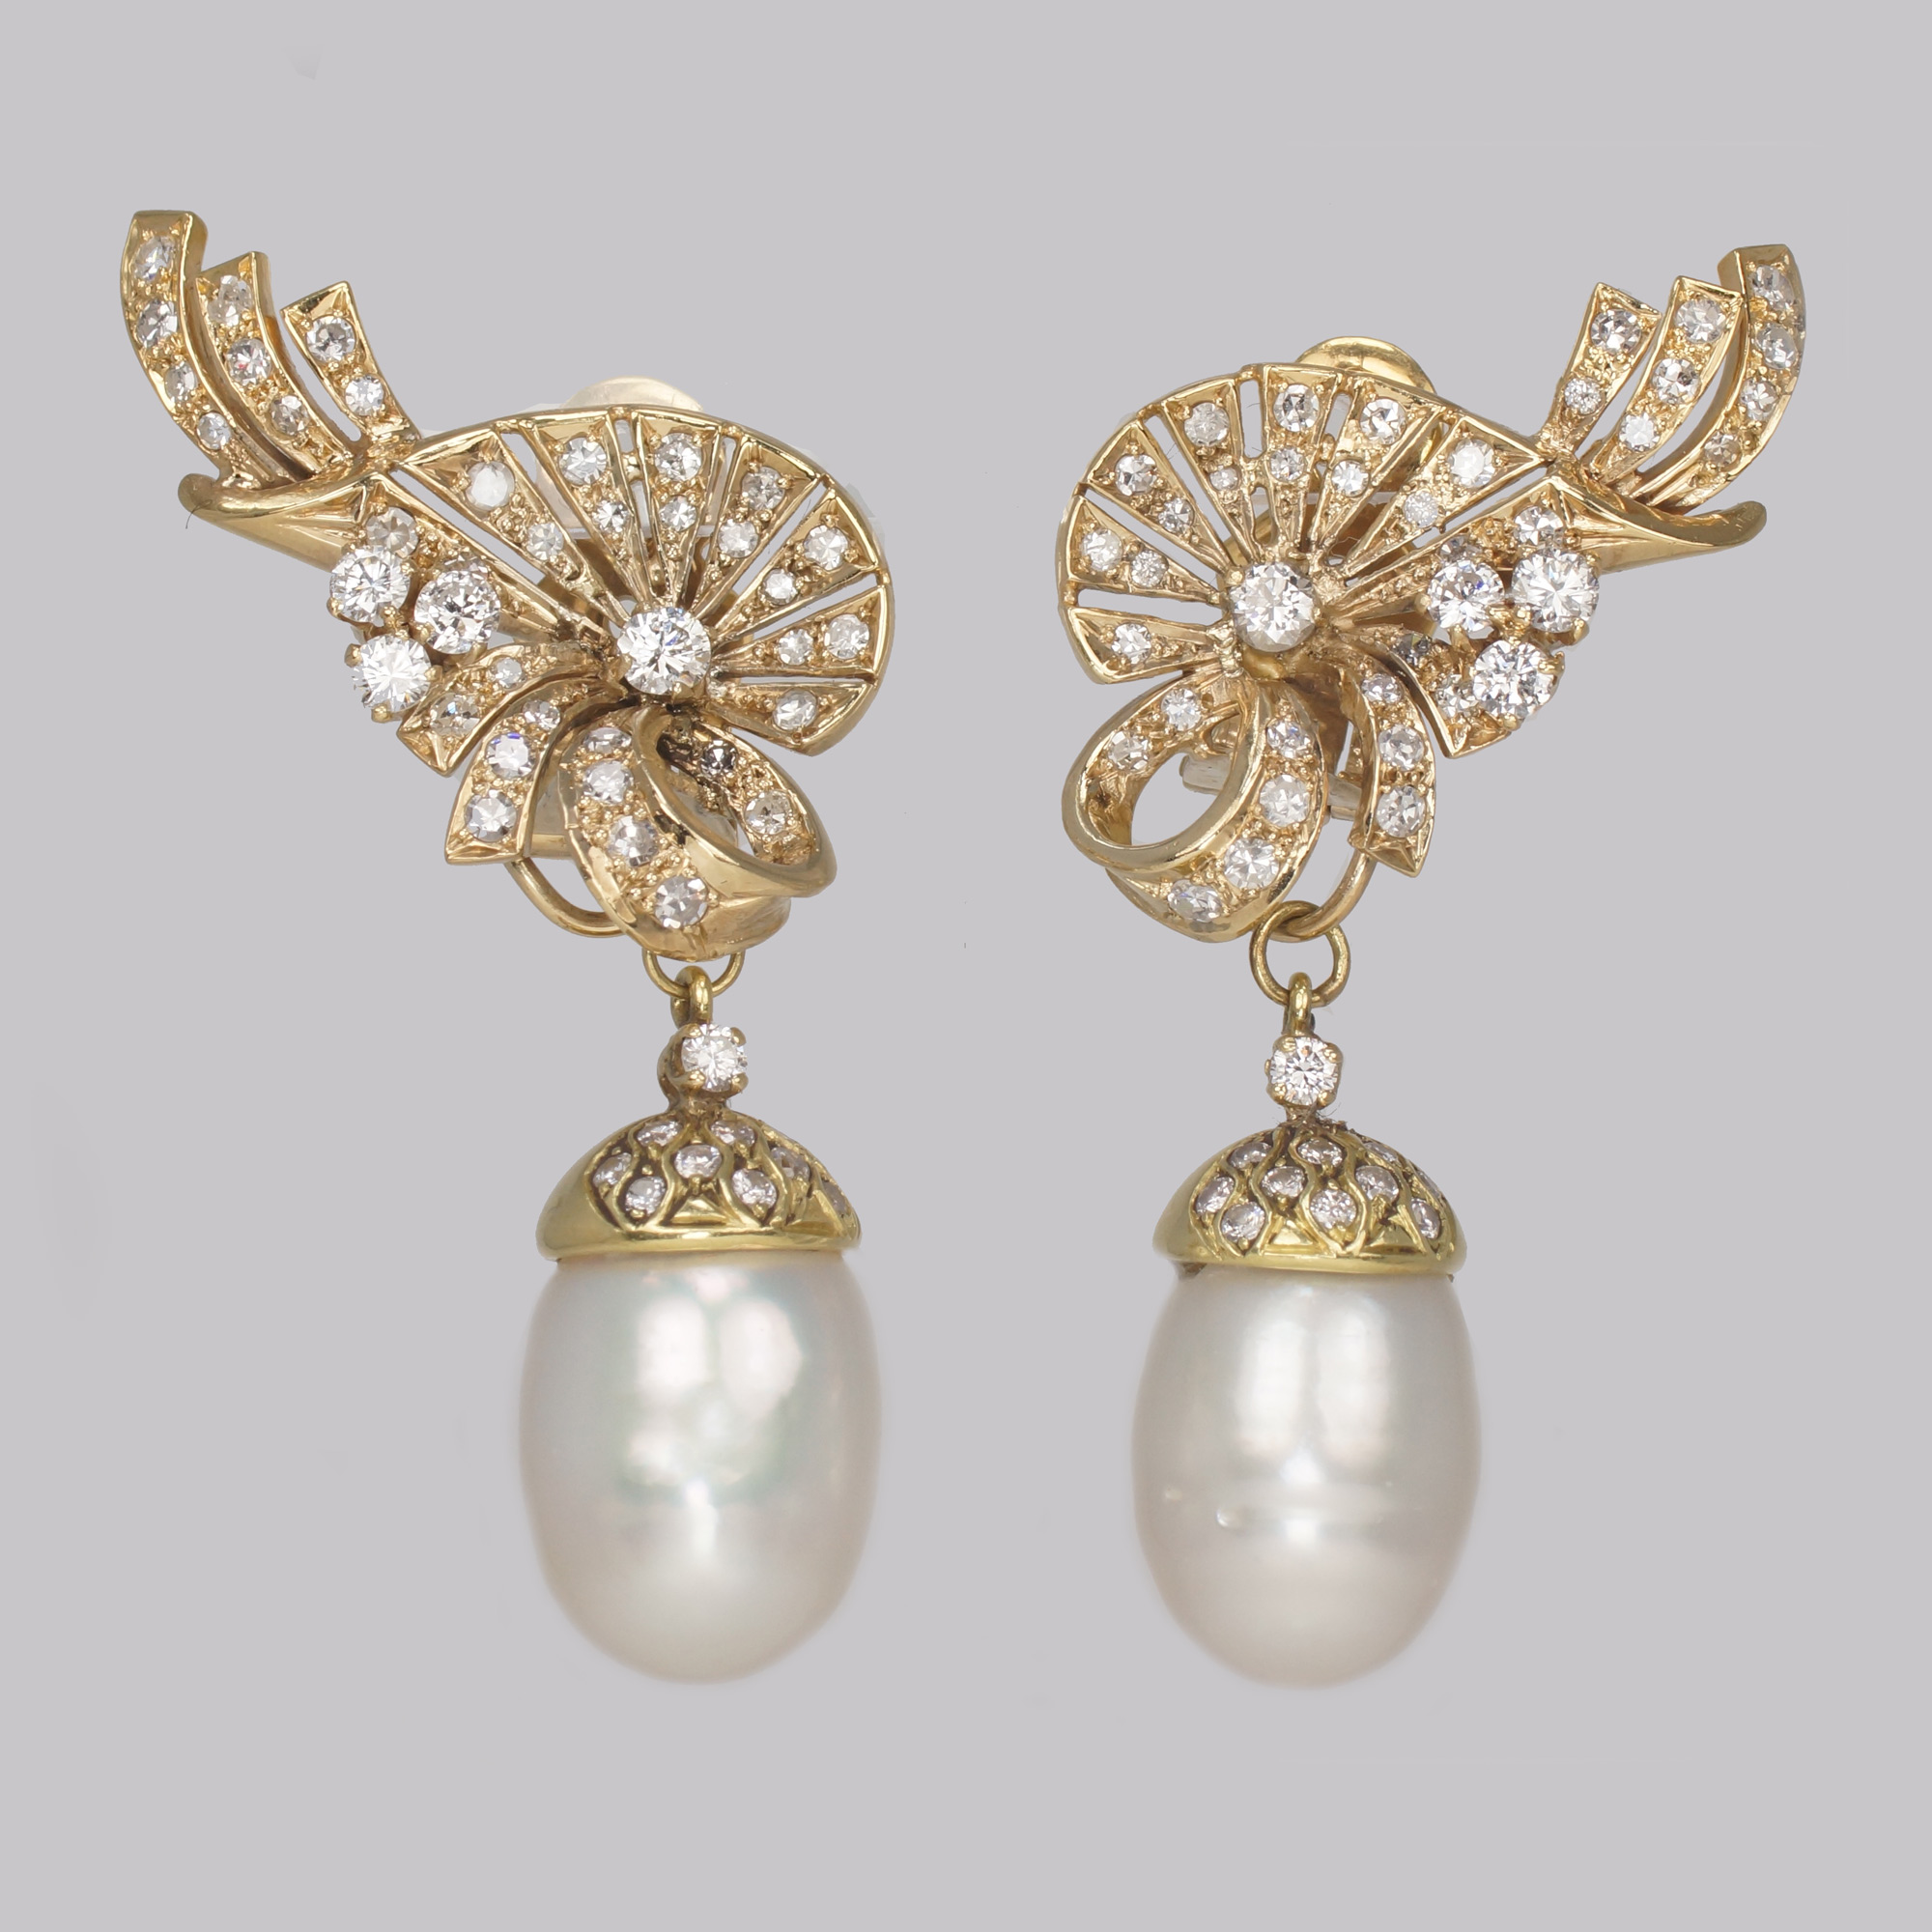 Victorian diamond pendant earrings